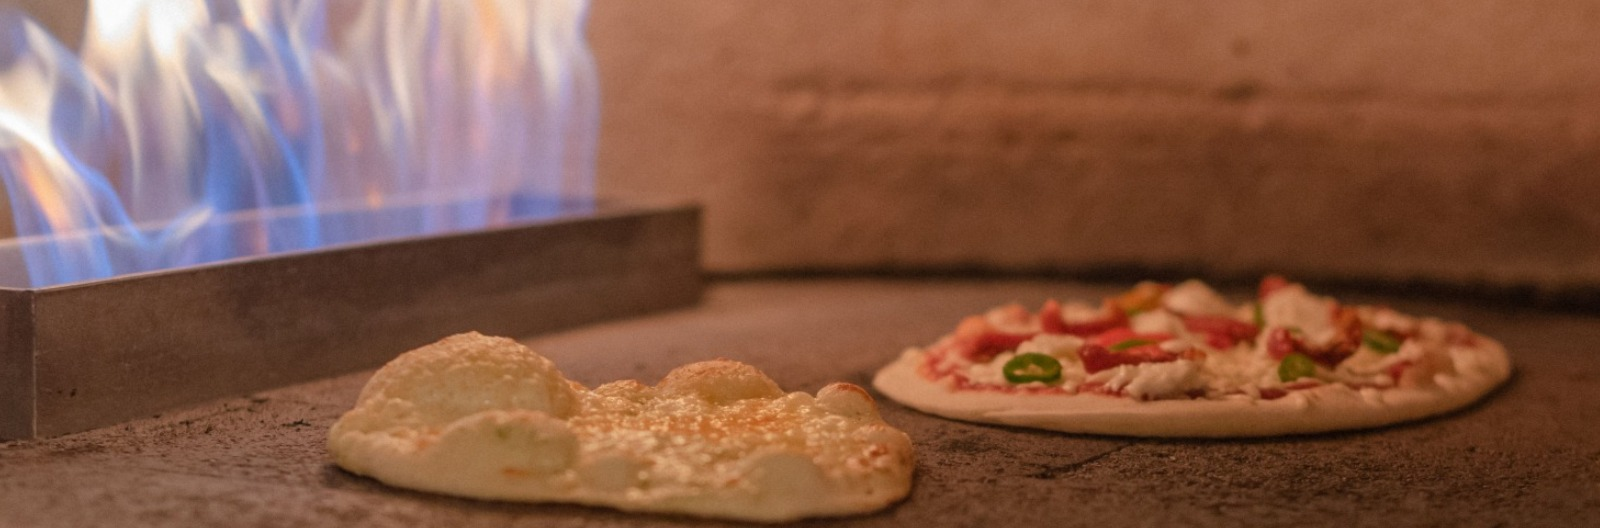 Pizza menu tomatoes